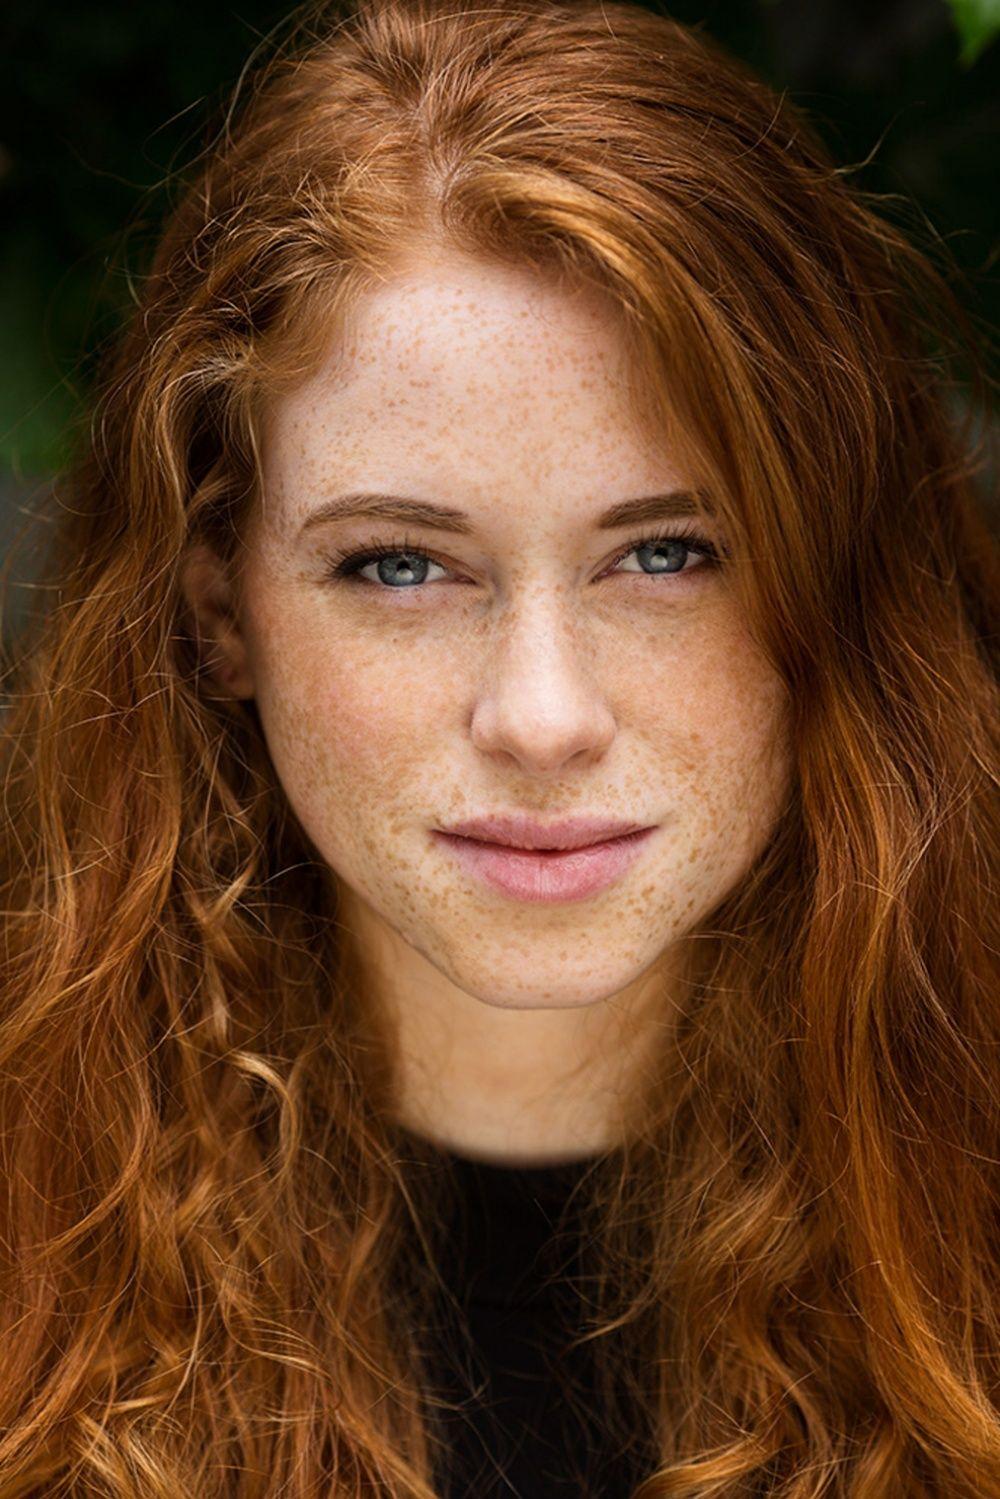 Redhead pale plump